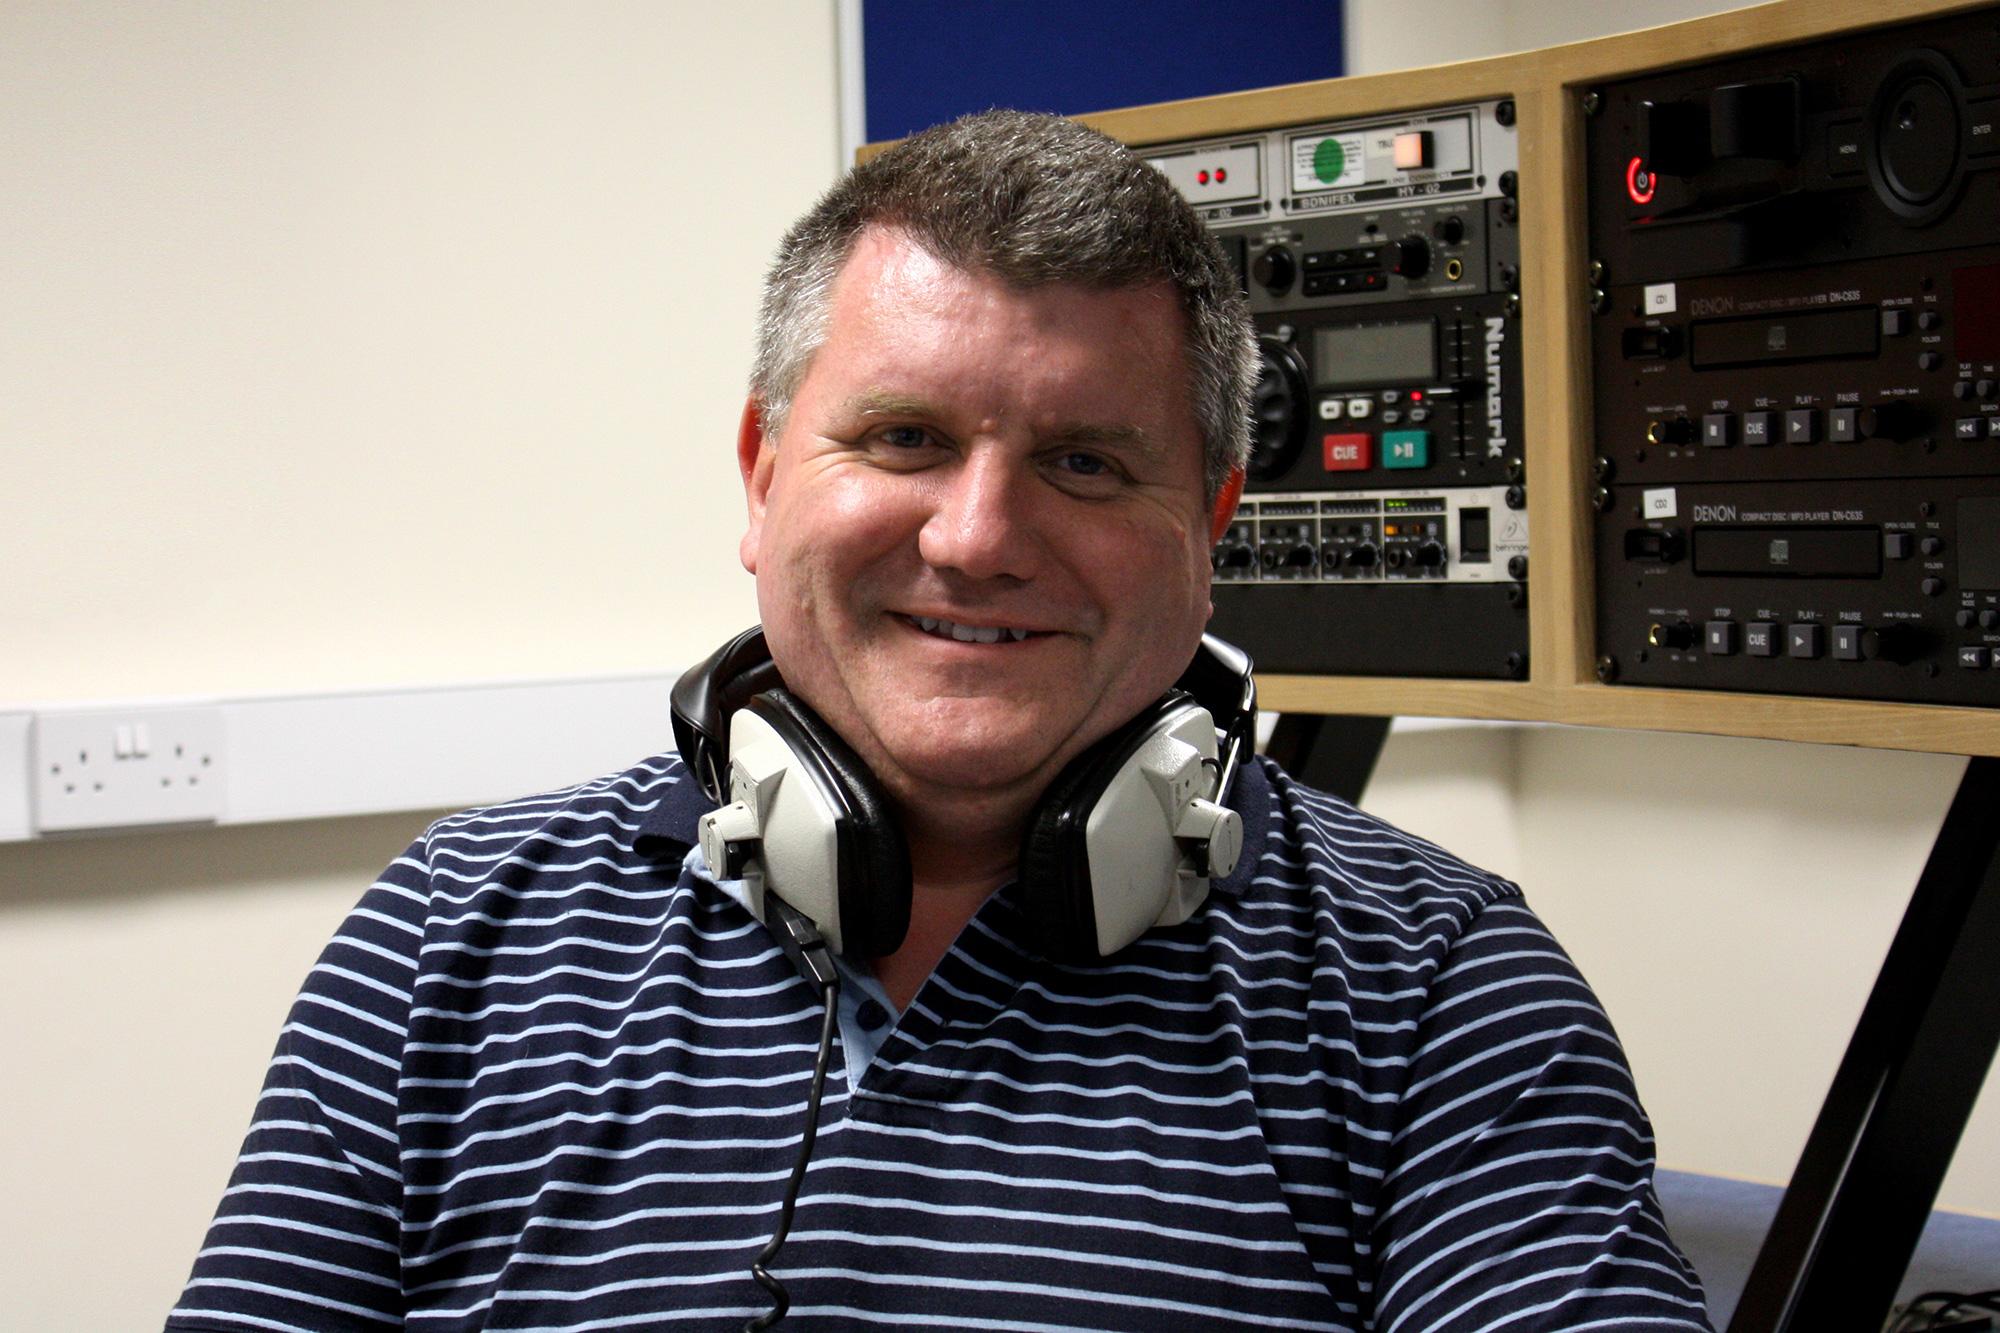 Keith Chilvers - Founding member of Radio Harrow